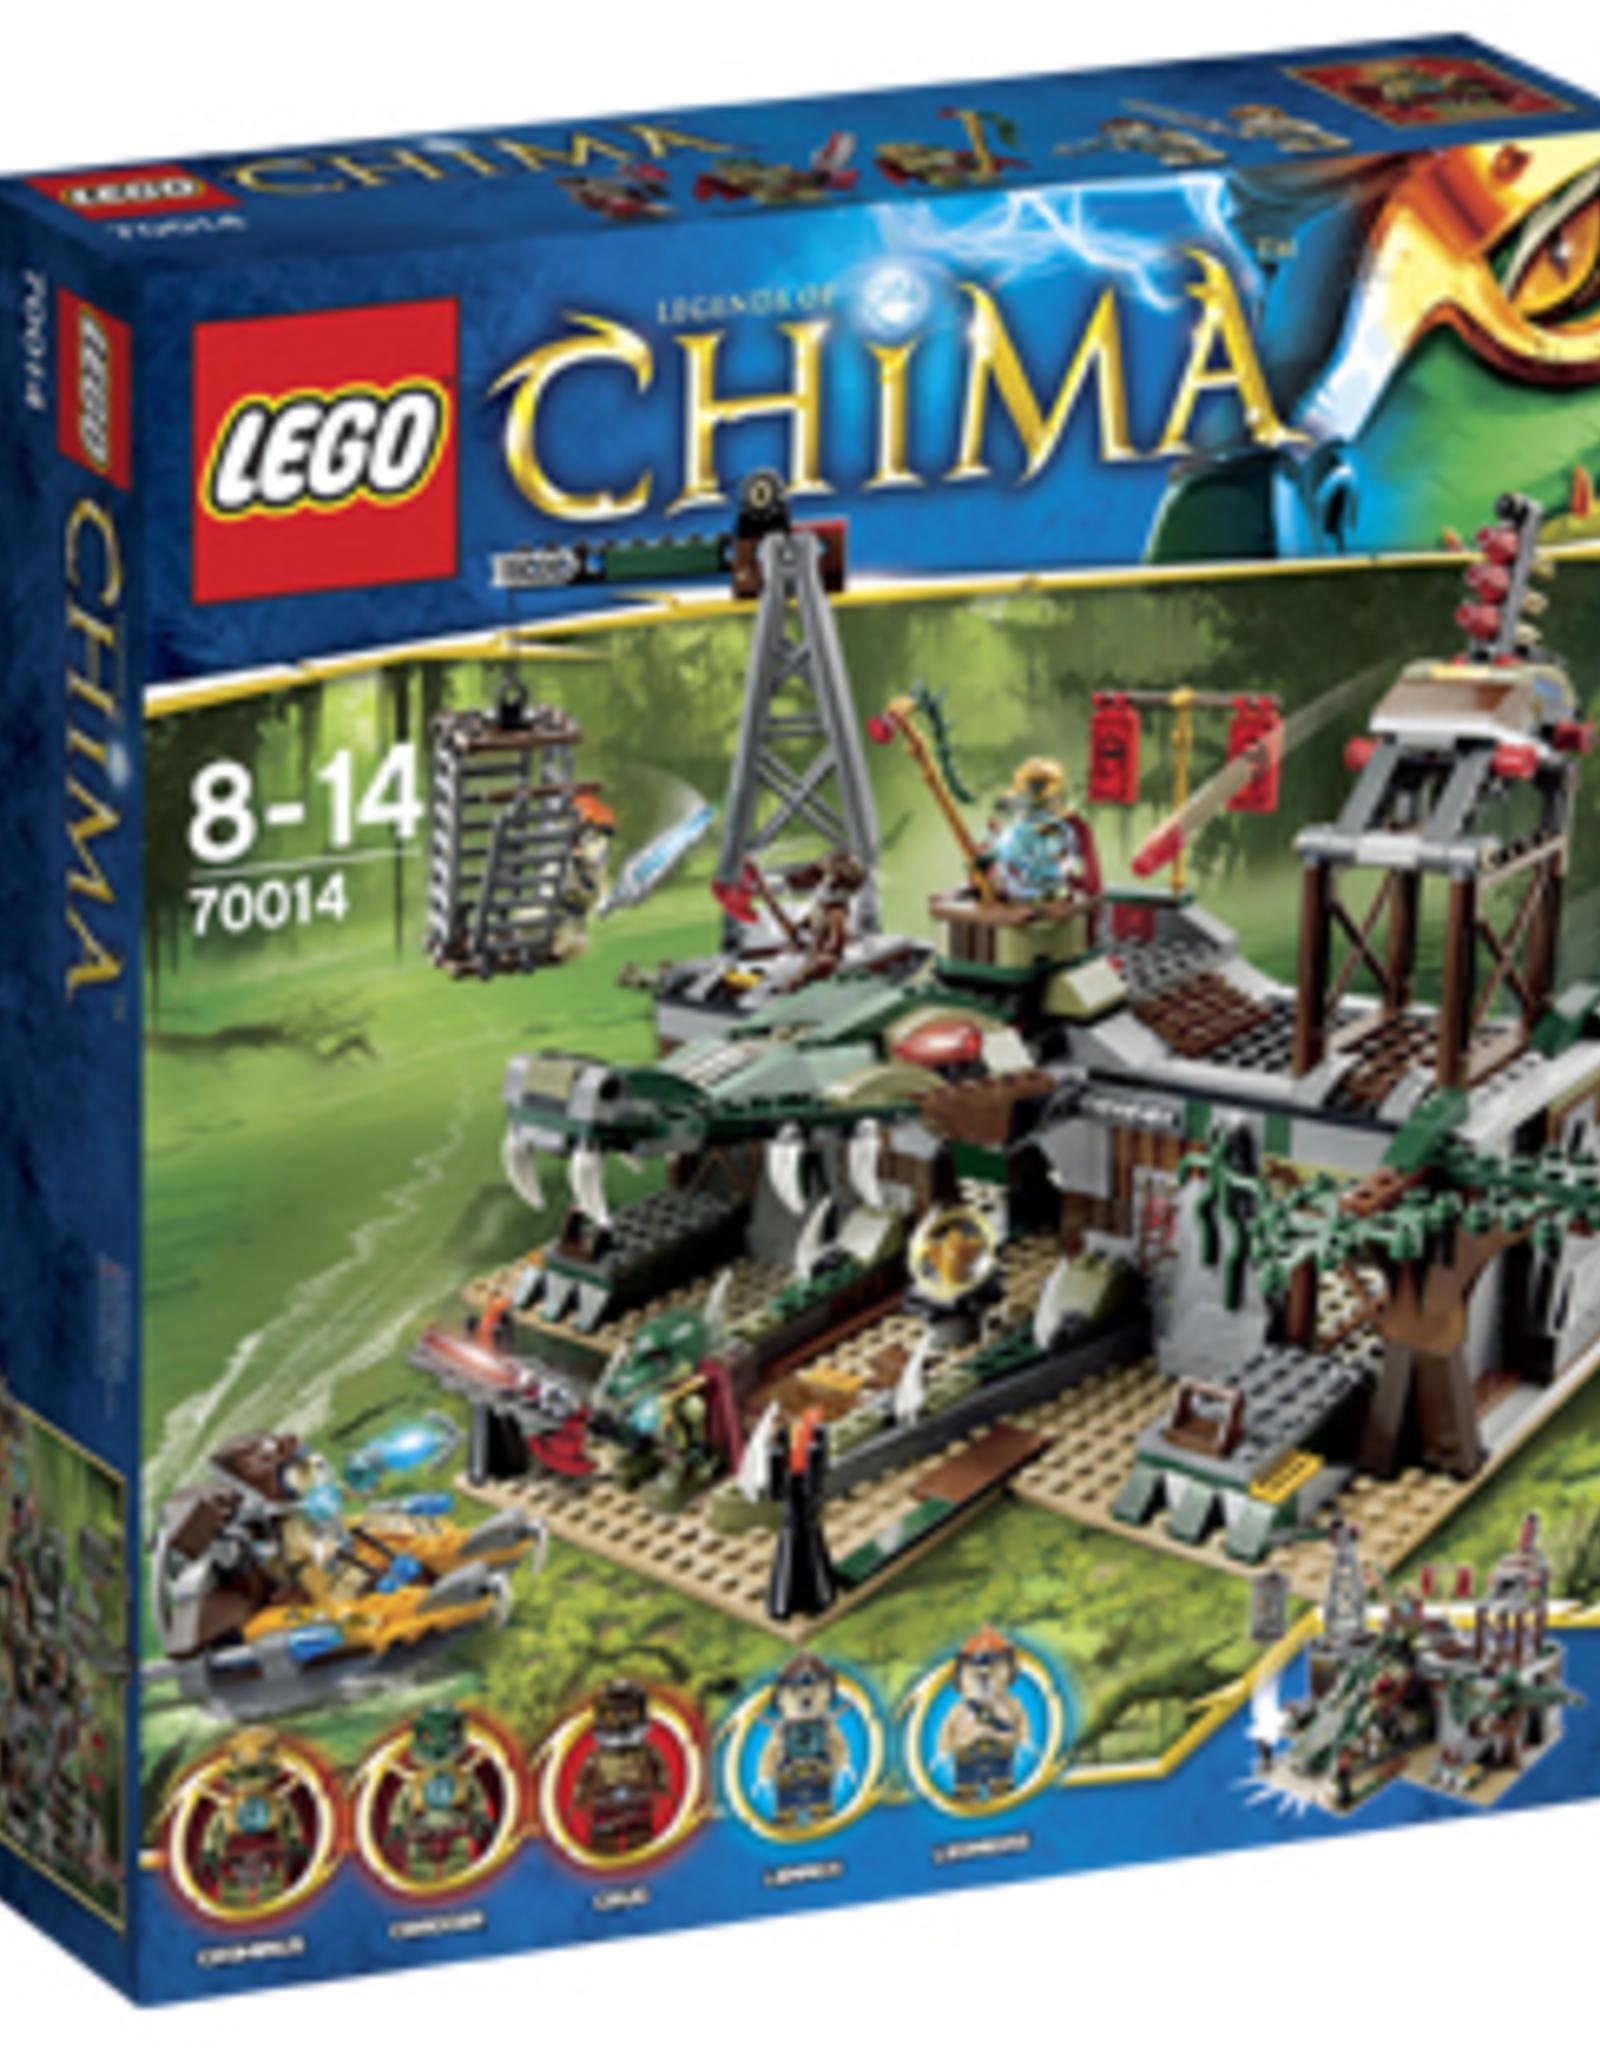 LEGO LEGO 70014 The Croc Swamp Hideout CHIMA